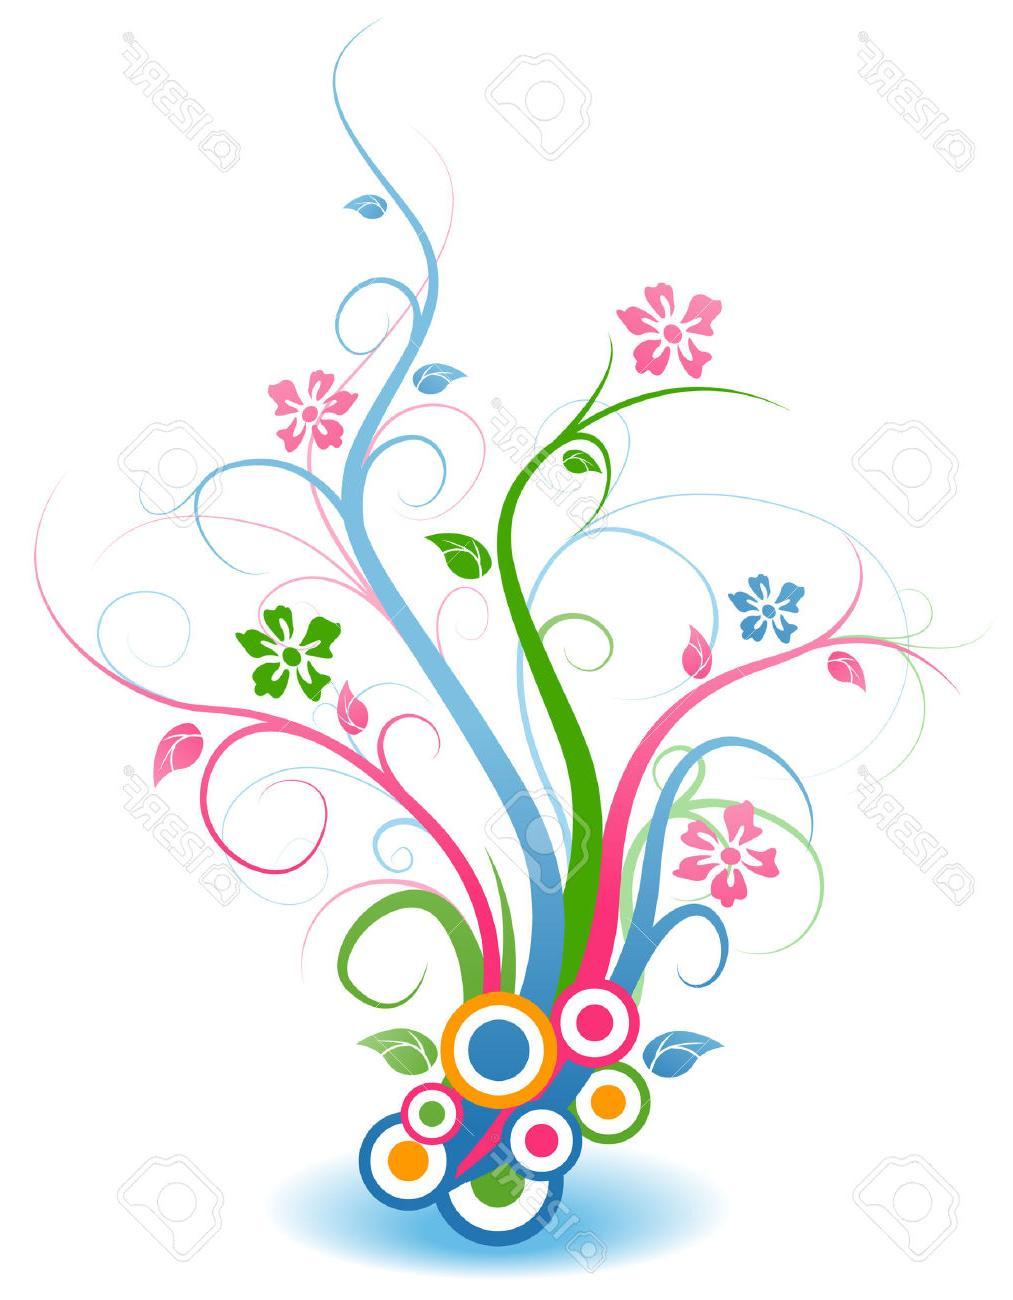 1013x1300 Best Hd Floral Vines Stock Vector Flower Art Clip Pictures